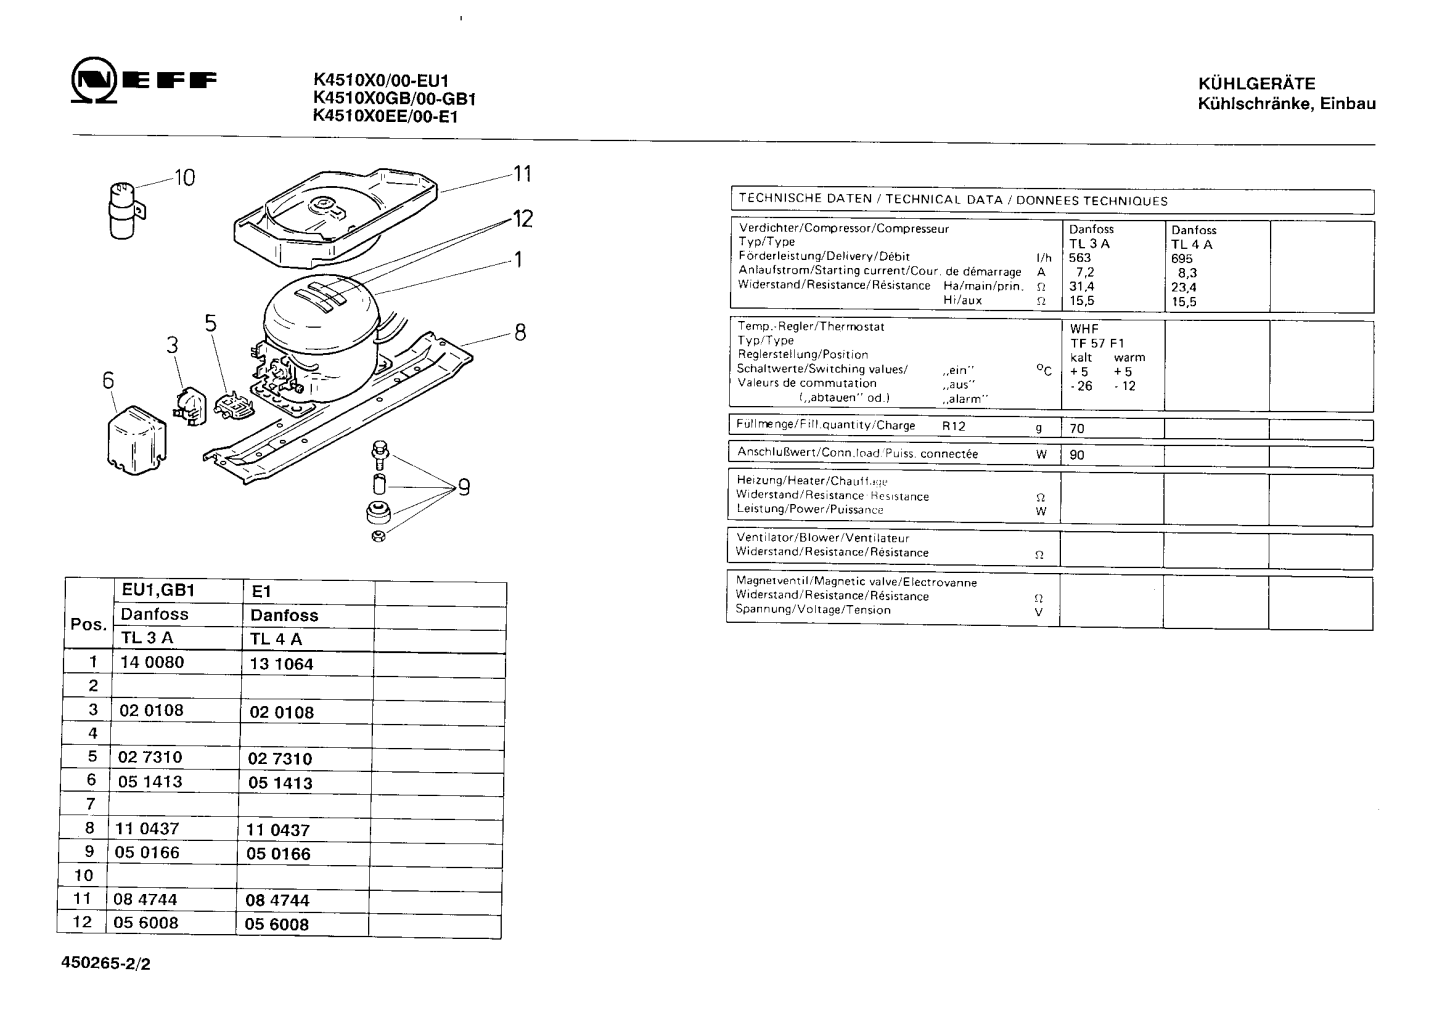 danfoss compressor wiring danfoss image wiring diagram personal website of kieran o shea danfoss compressor starting on danfoss compressor wiring